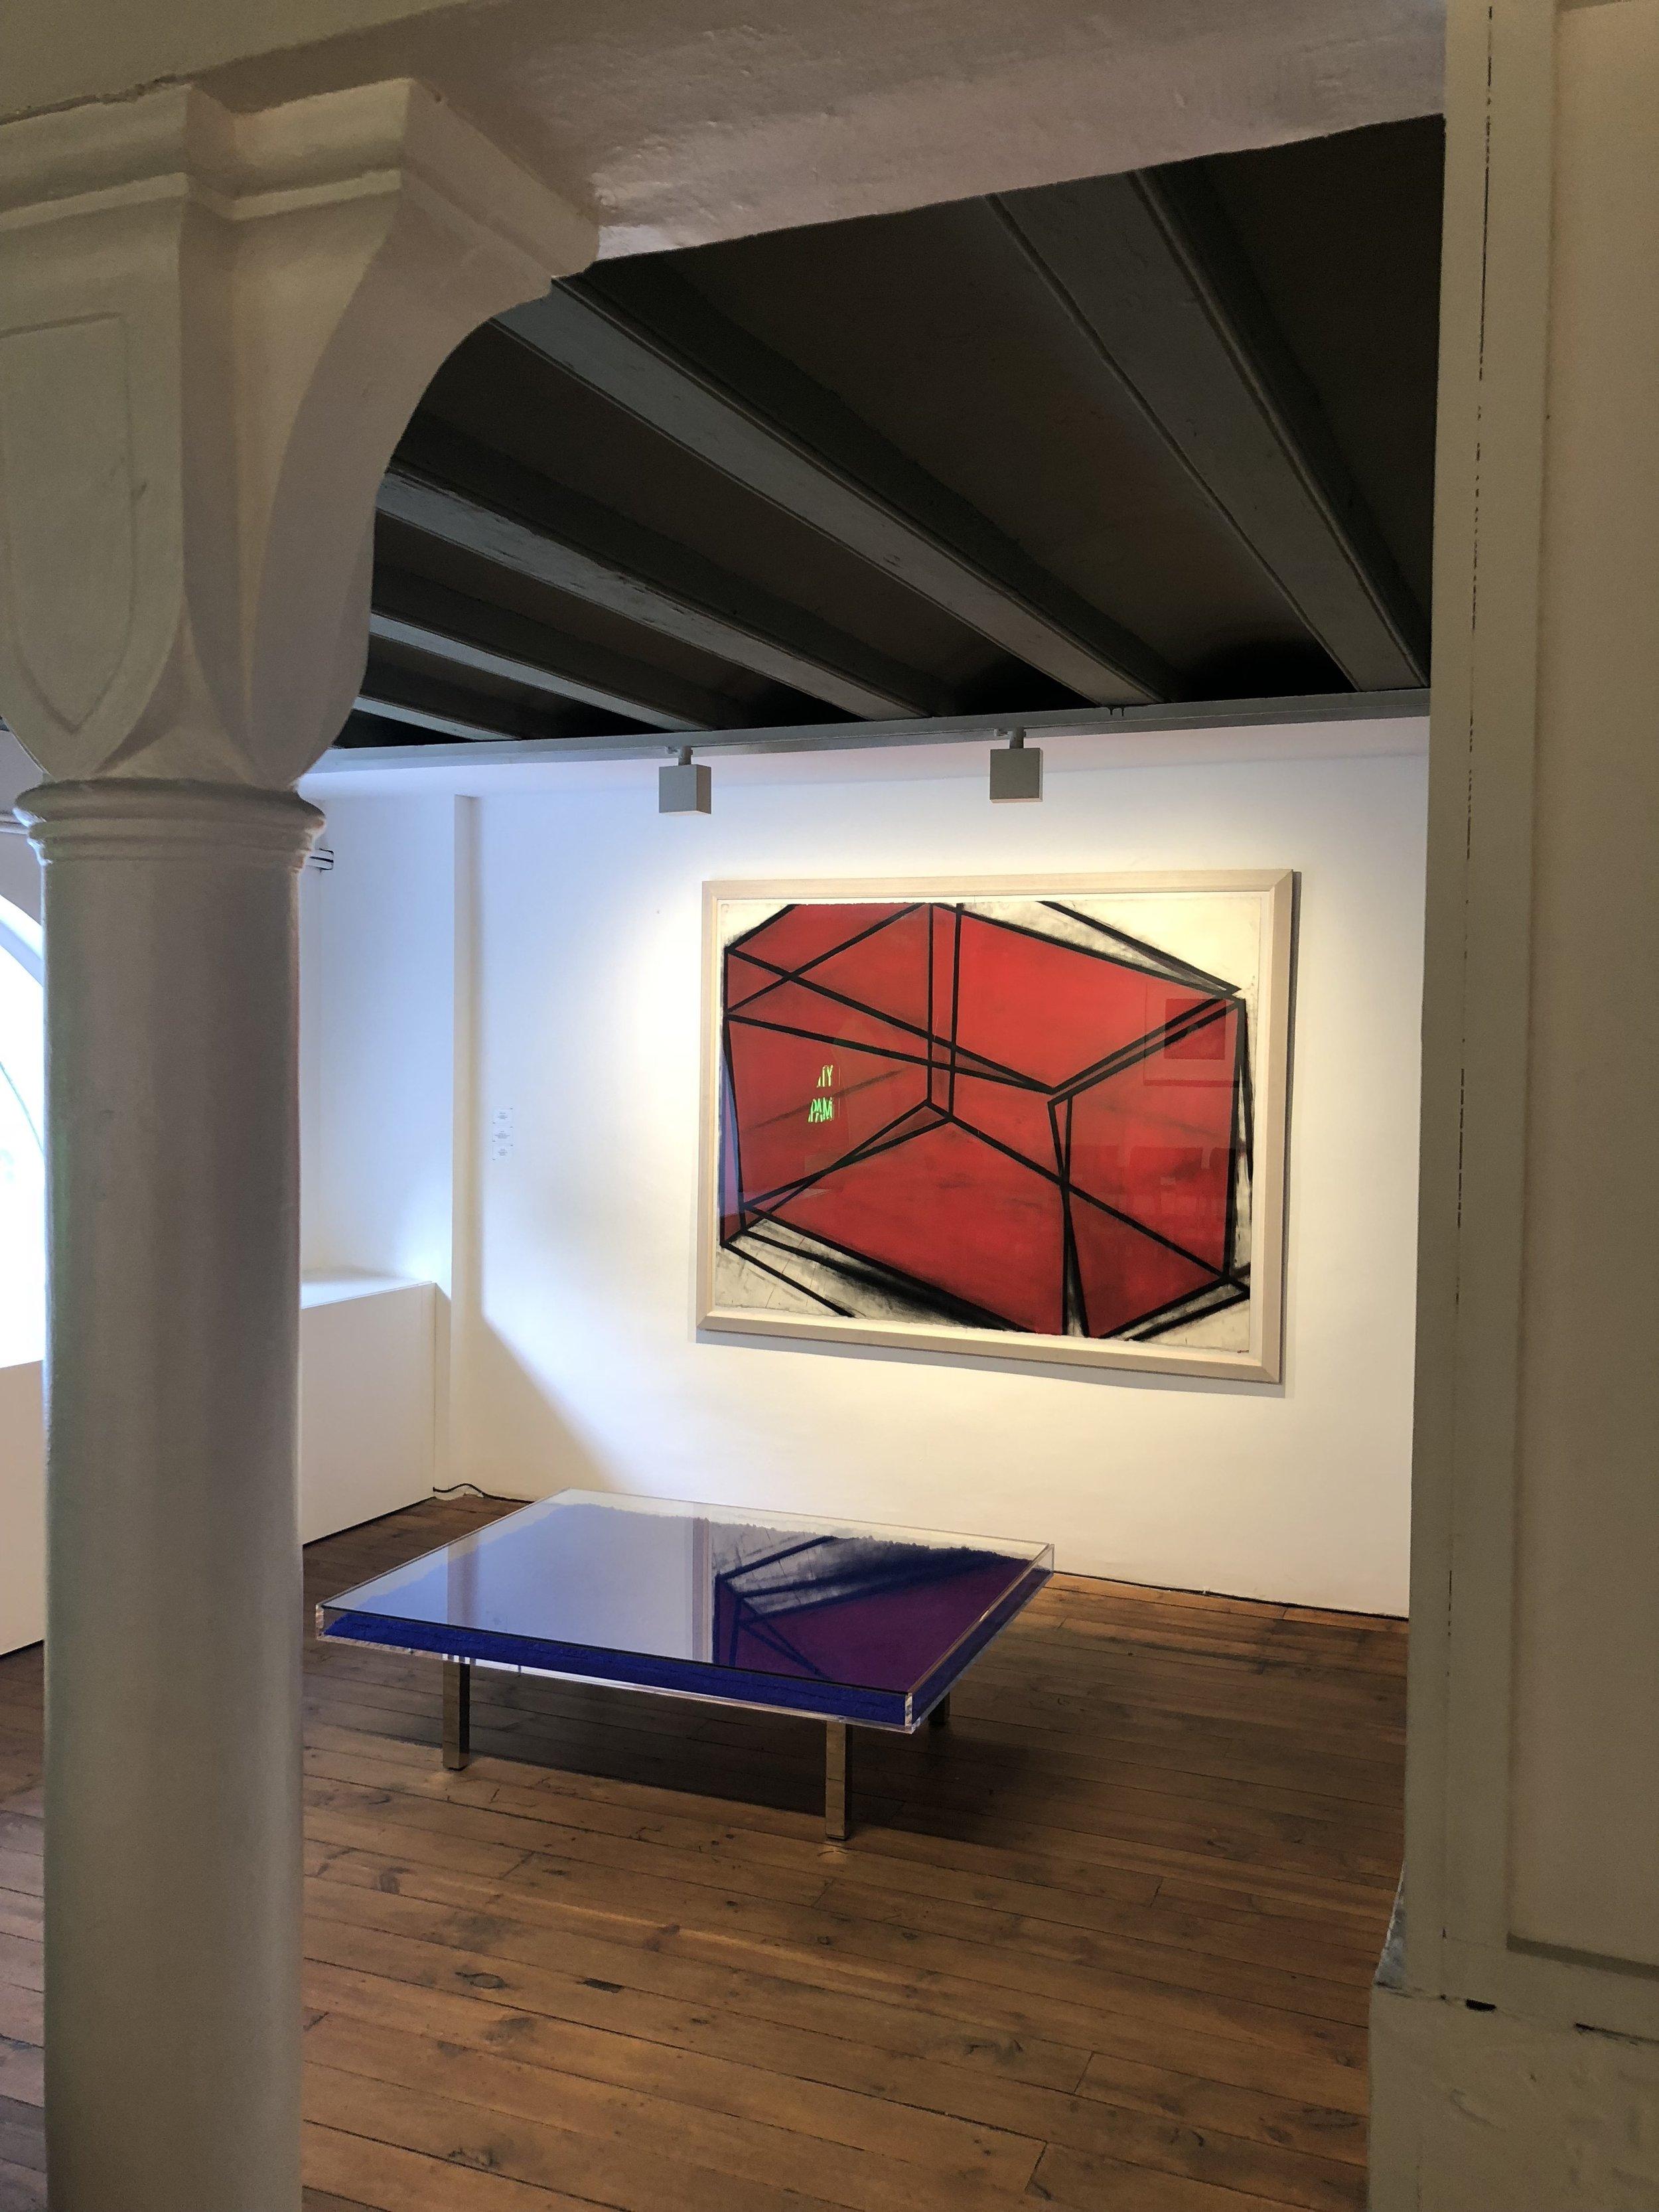 The permanent collection of Galeria Senda